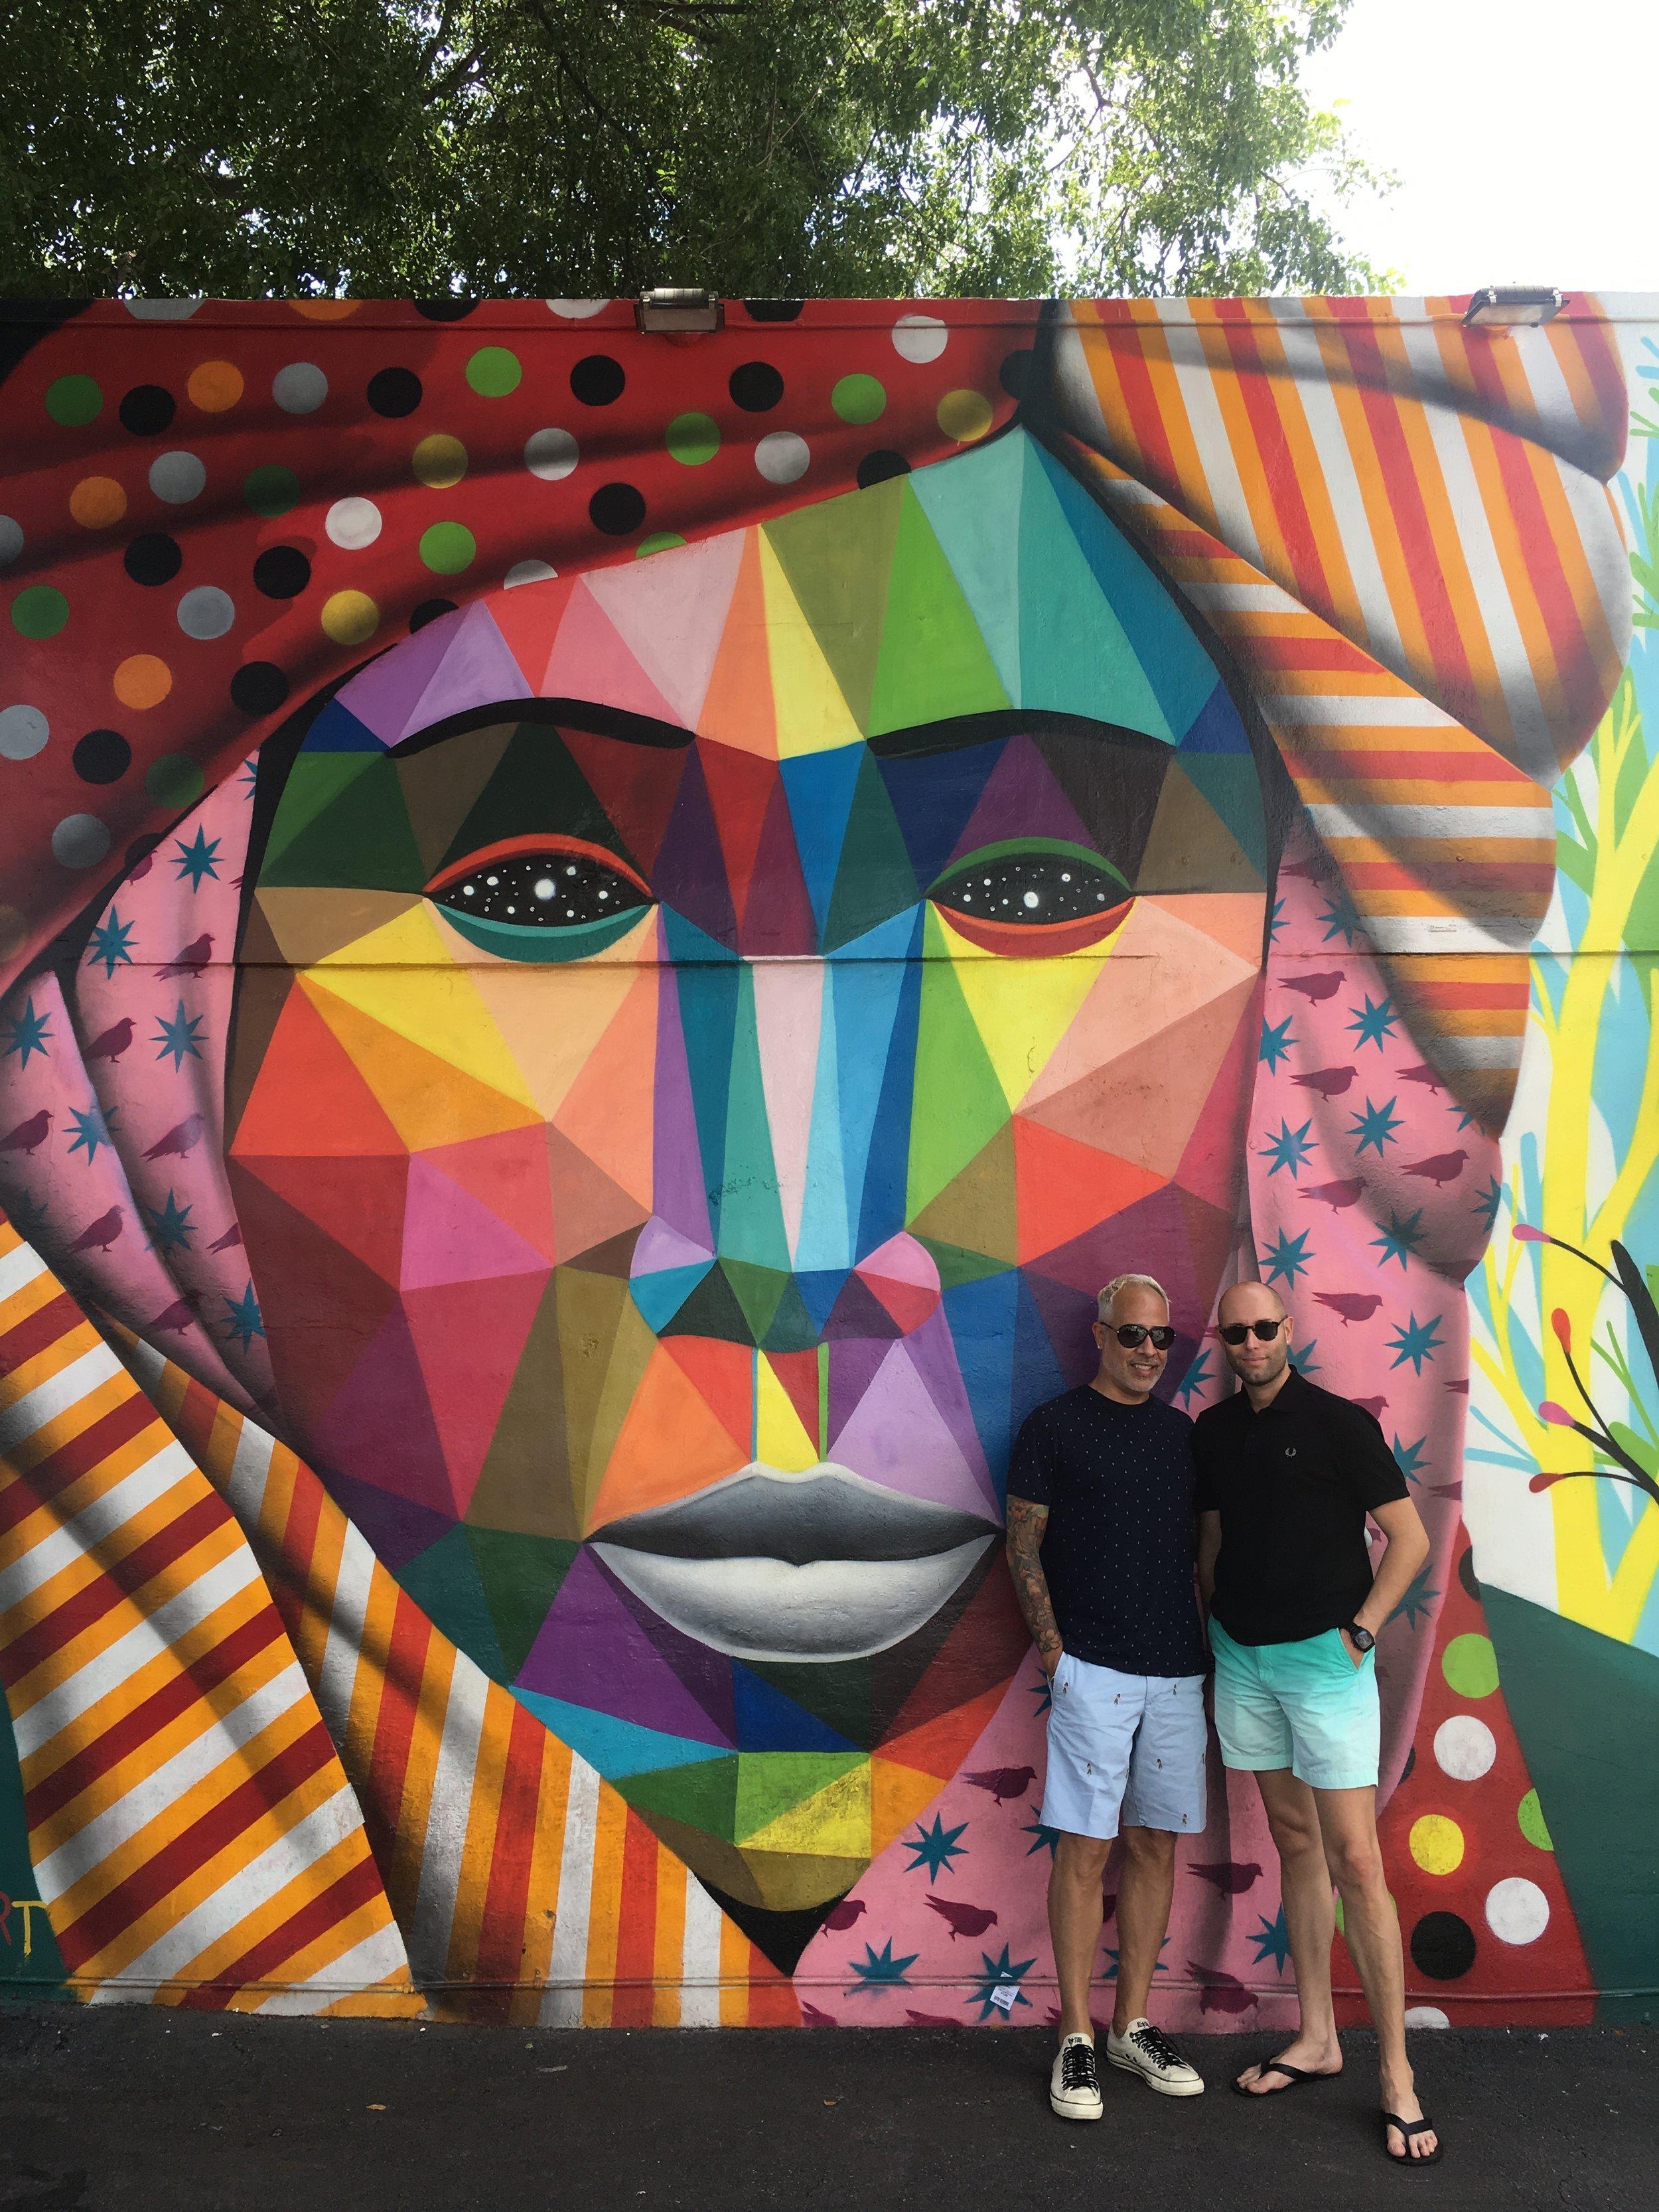 wynwood walls e. vincent martinez alex page #thepageofalex